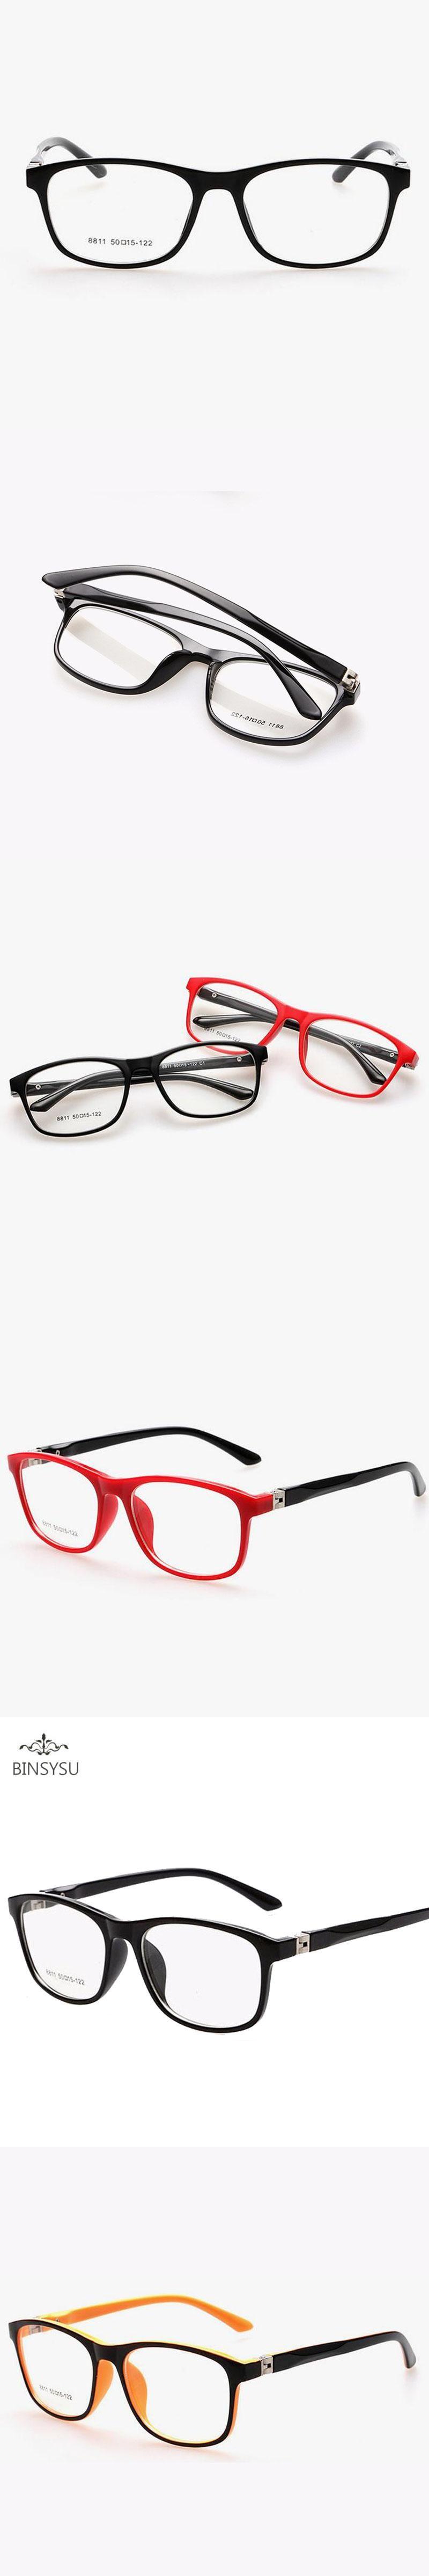 199680fc51b9 TR90 children optical frame eyewear wholesale eyeglasses 7 colors Double  Color New Style Girls Boys Kids Glasses big Frame 8811